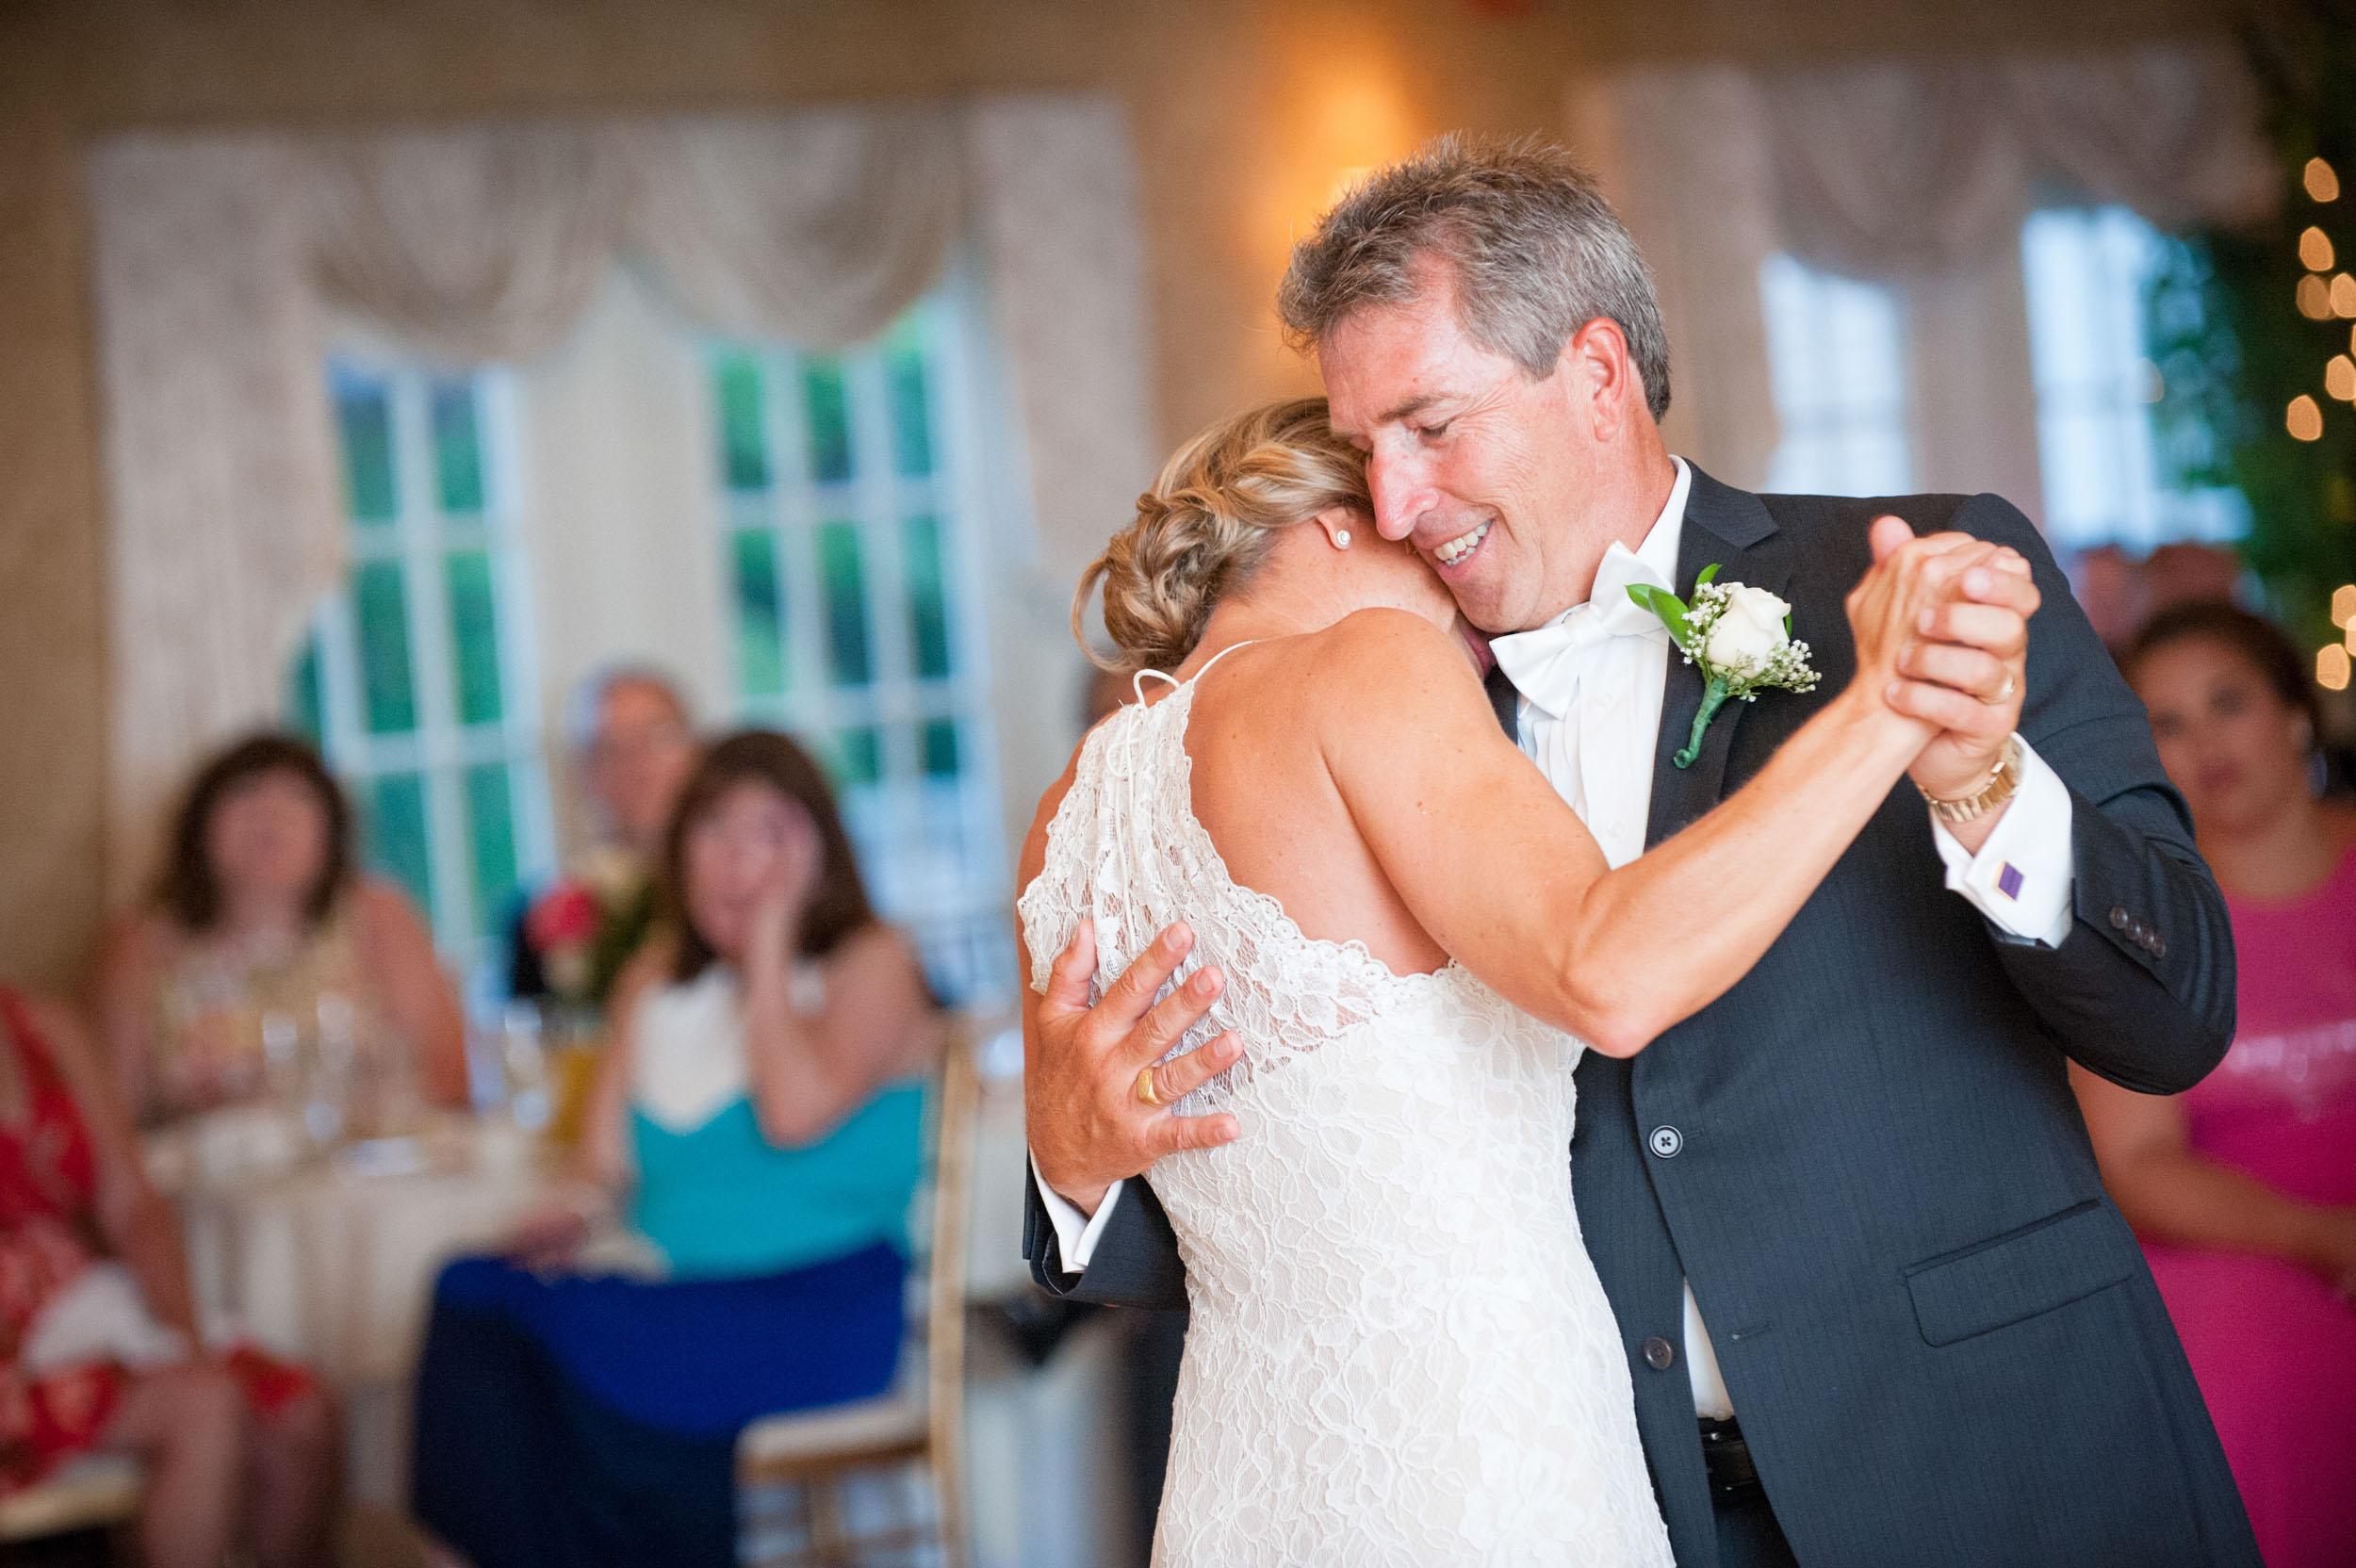 Wedding117PandP 345*2-2.jpg